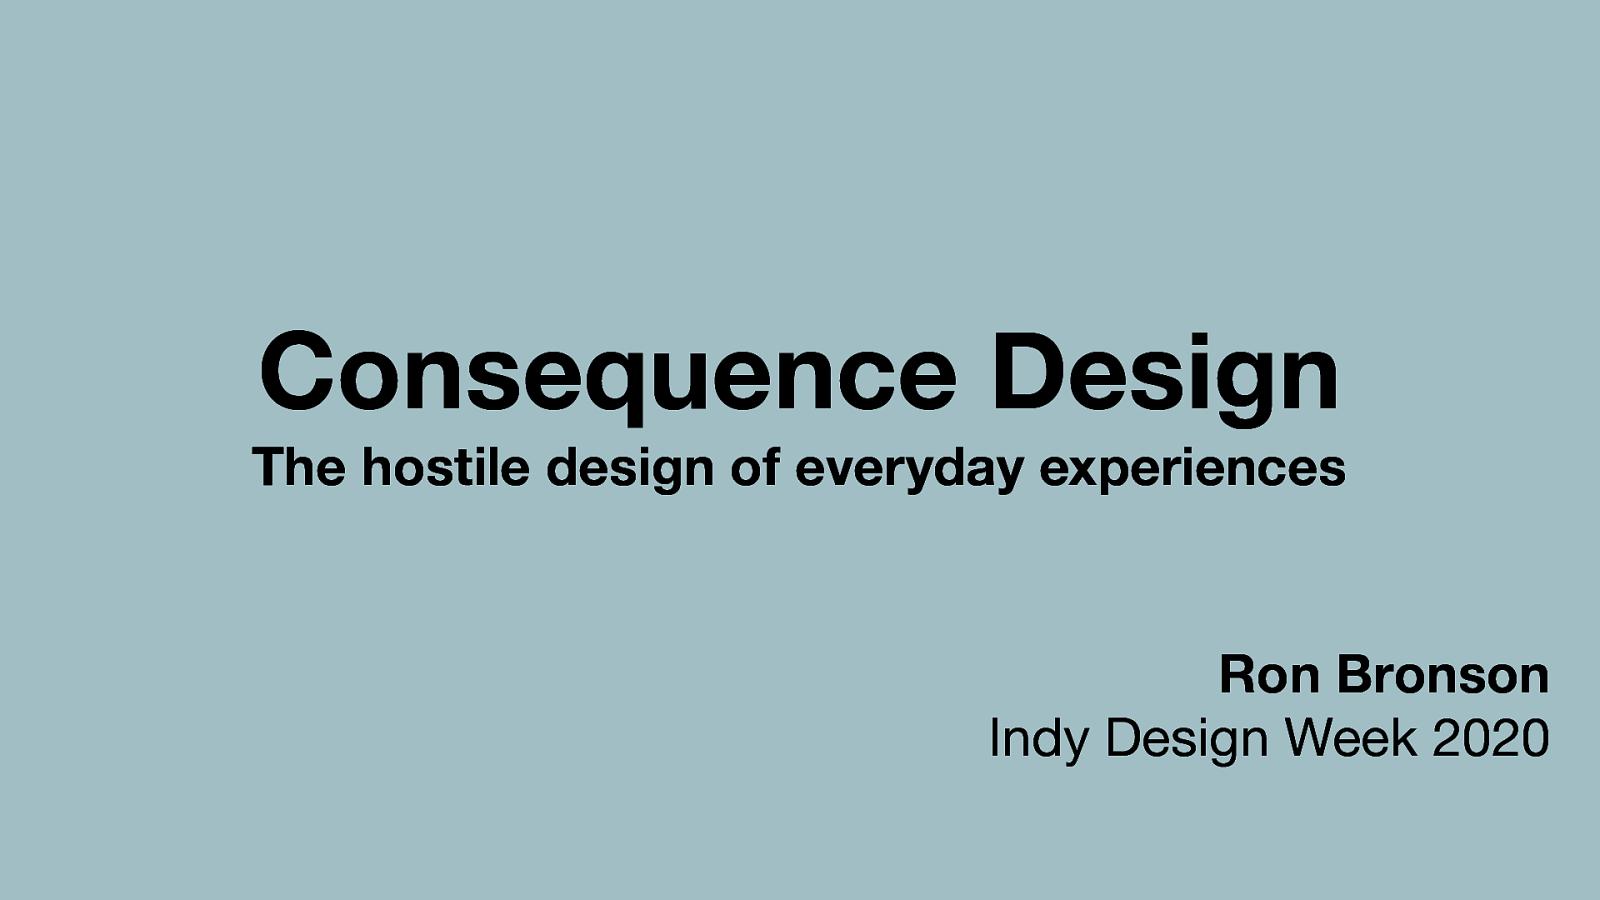 Hostile Design of Everyday Experiences